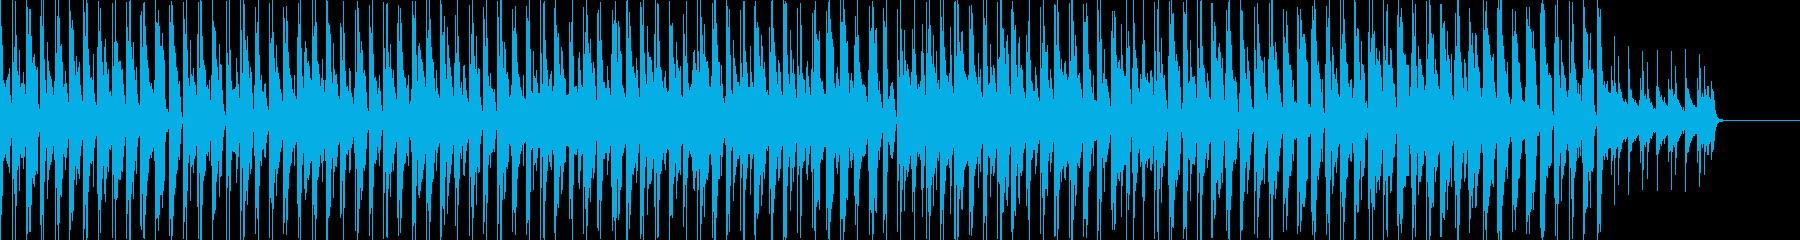 Heartwarming classical guitar pop's reproduced waveform